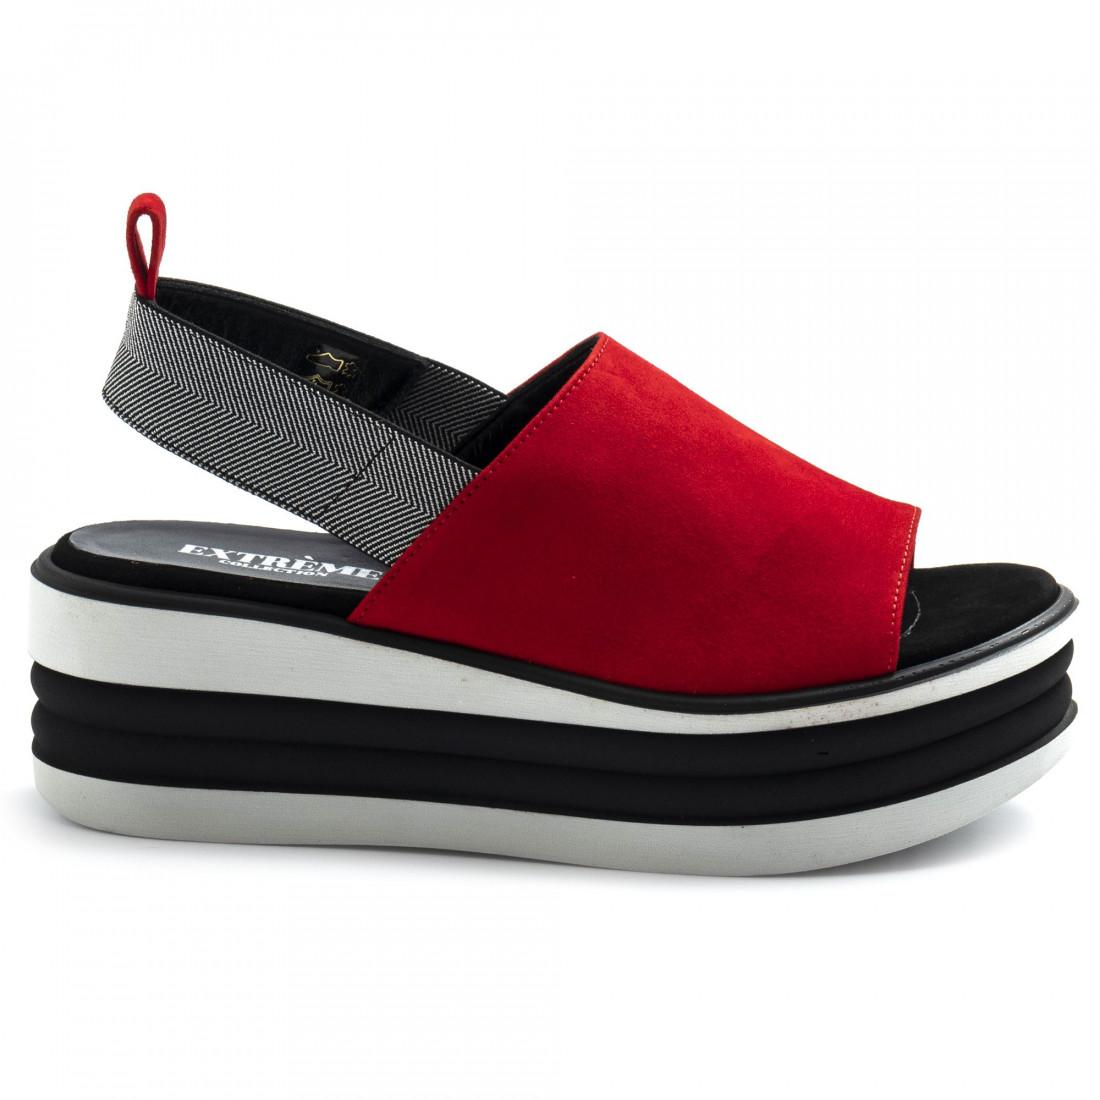 sandalen damen extreme 1901foxcamoscio rosso 8581